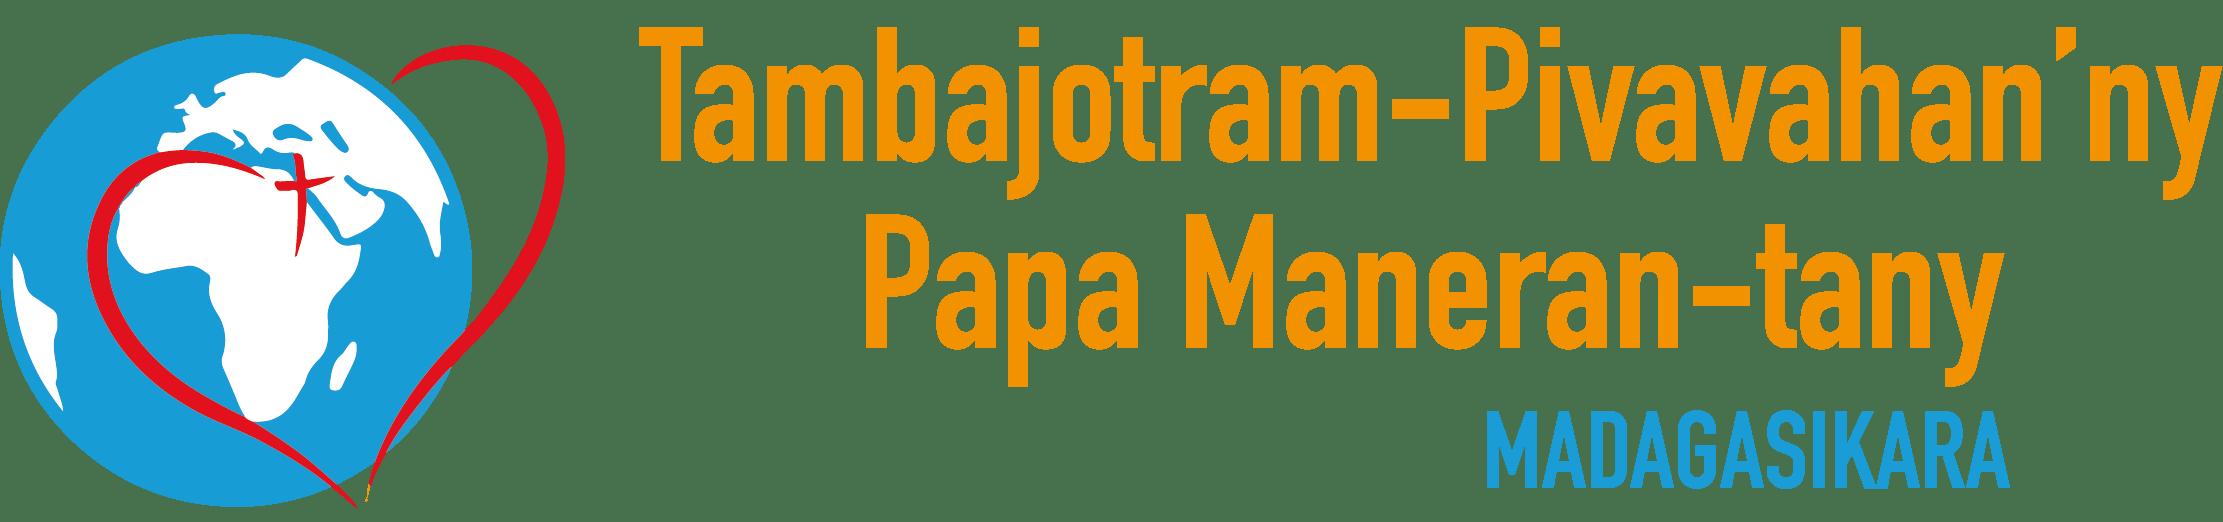 Tambajotram-Pivavahan'ny Papa Maneran-tany - MADAGASIKARA